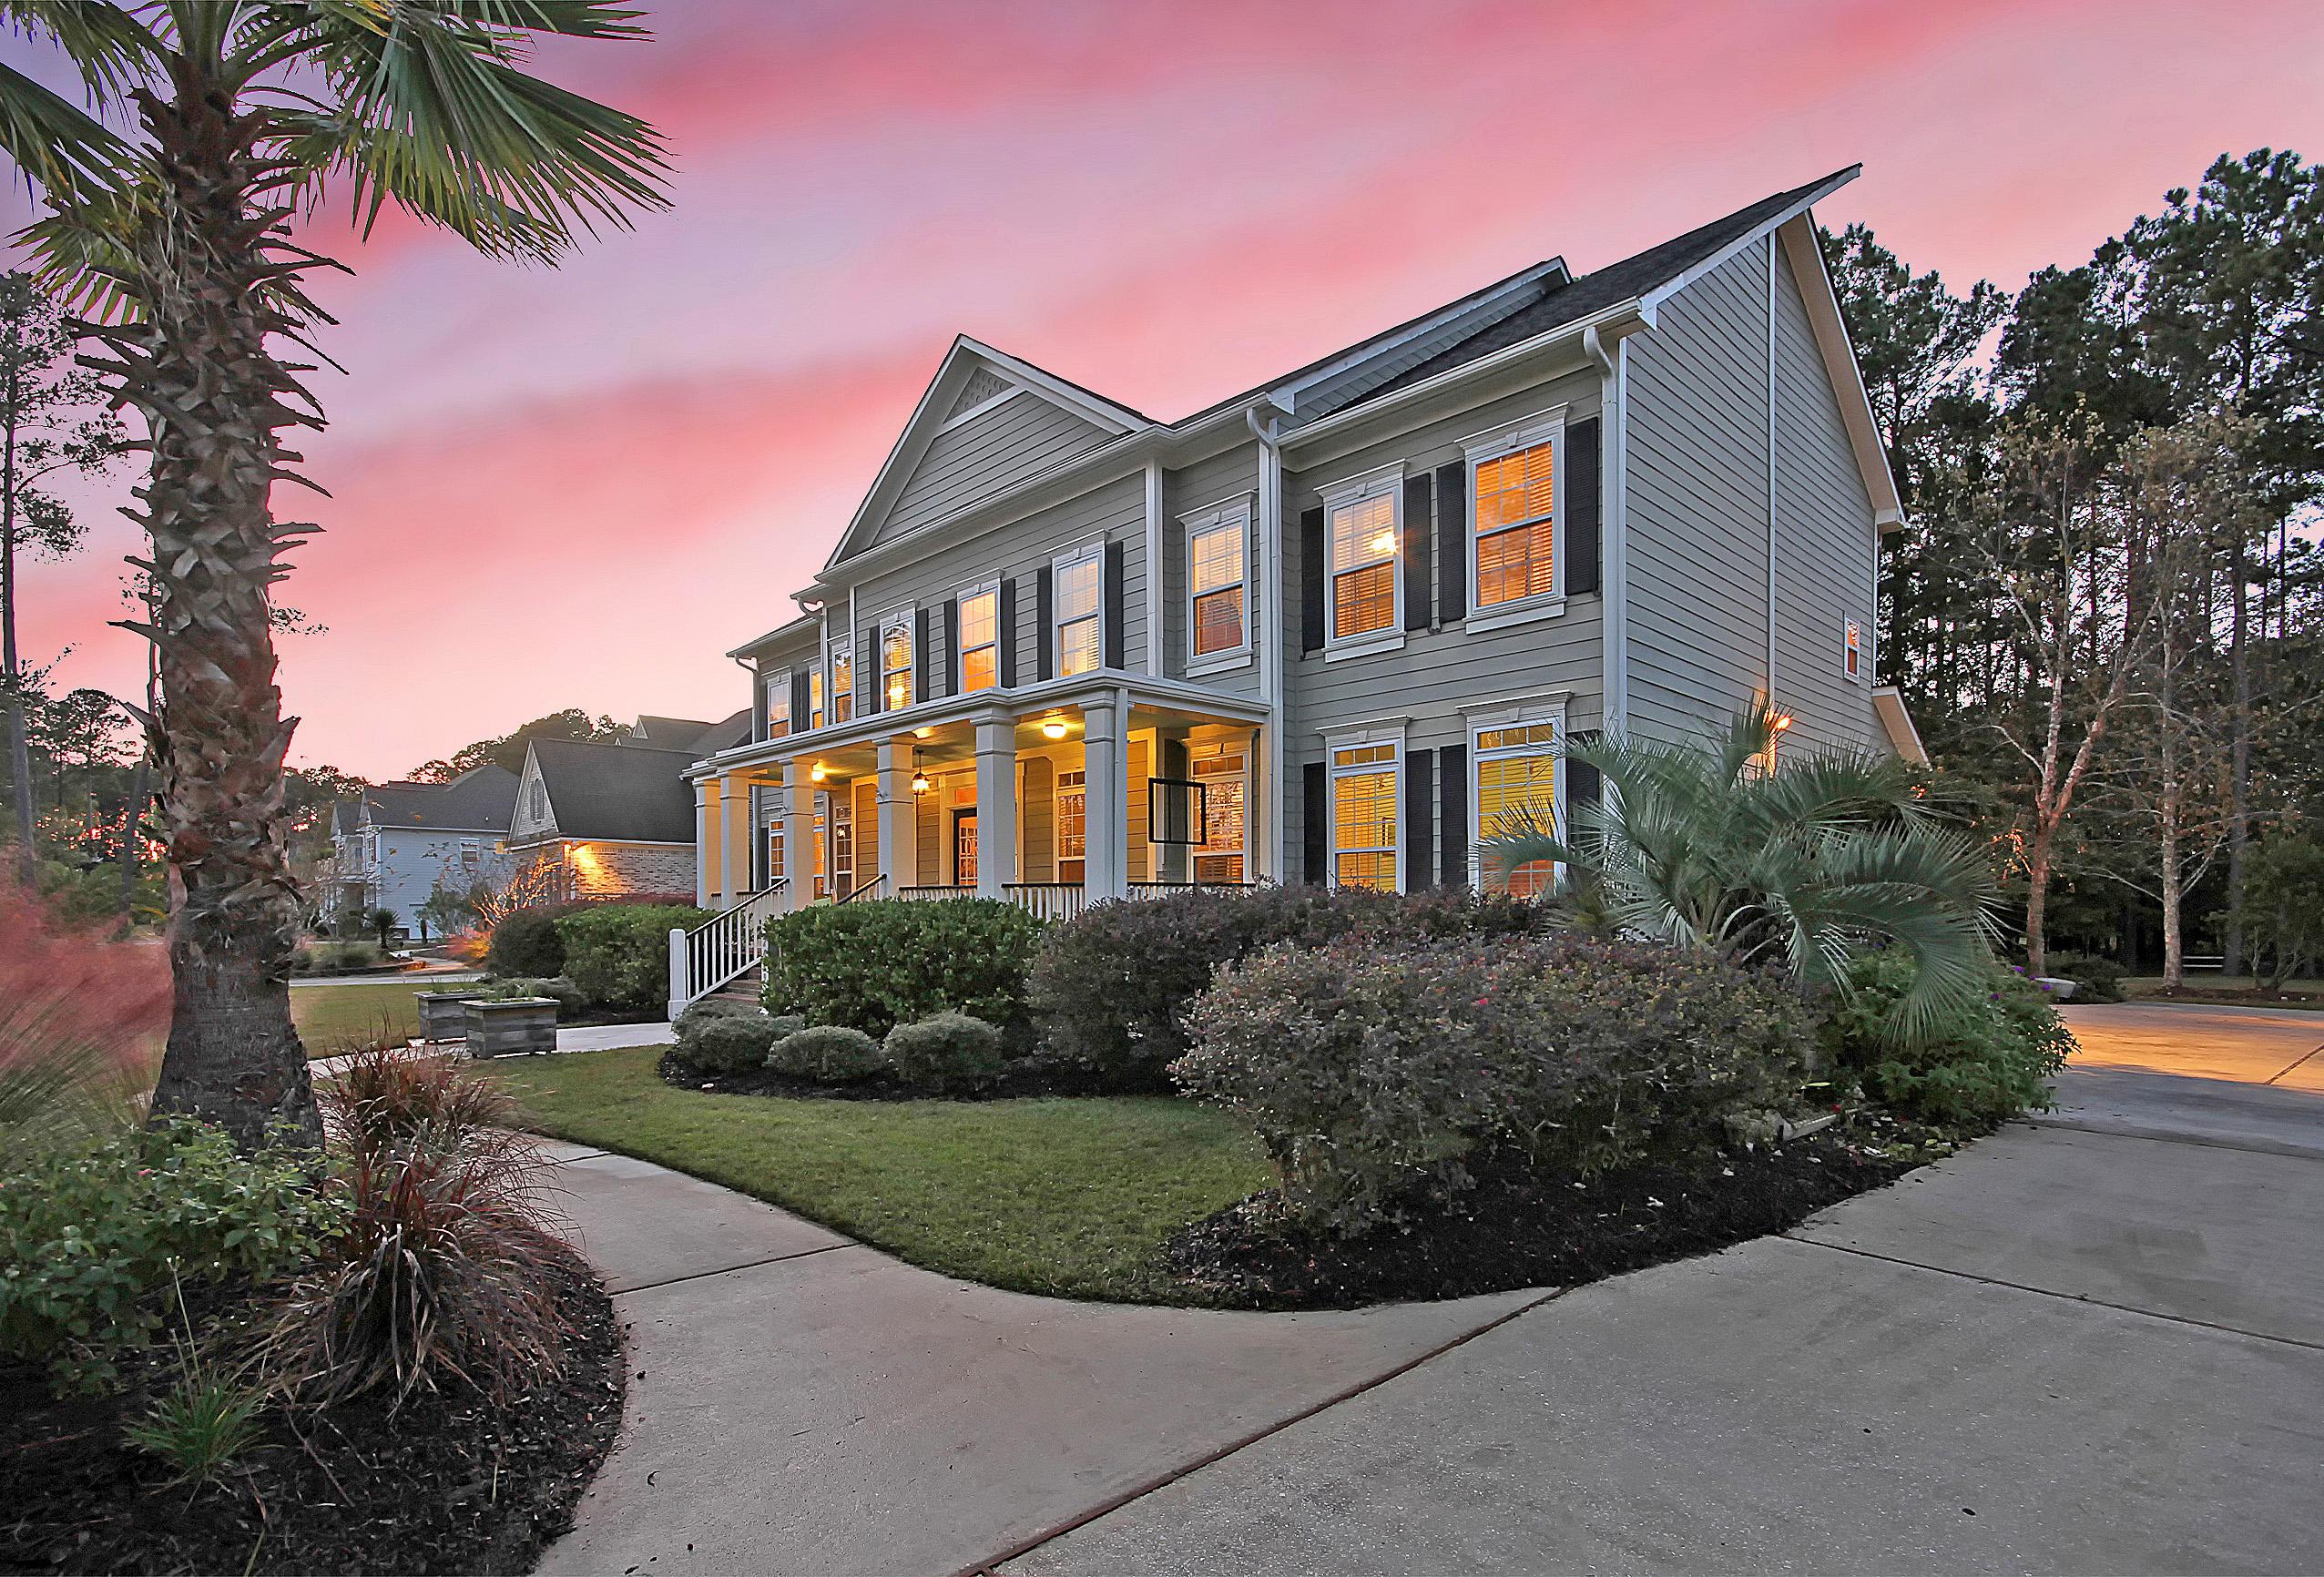 Dunes West Homes For Sale - 2449 Darts Cove, Mount Pleasant, SC - 25